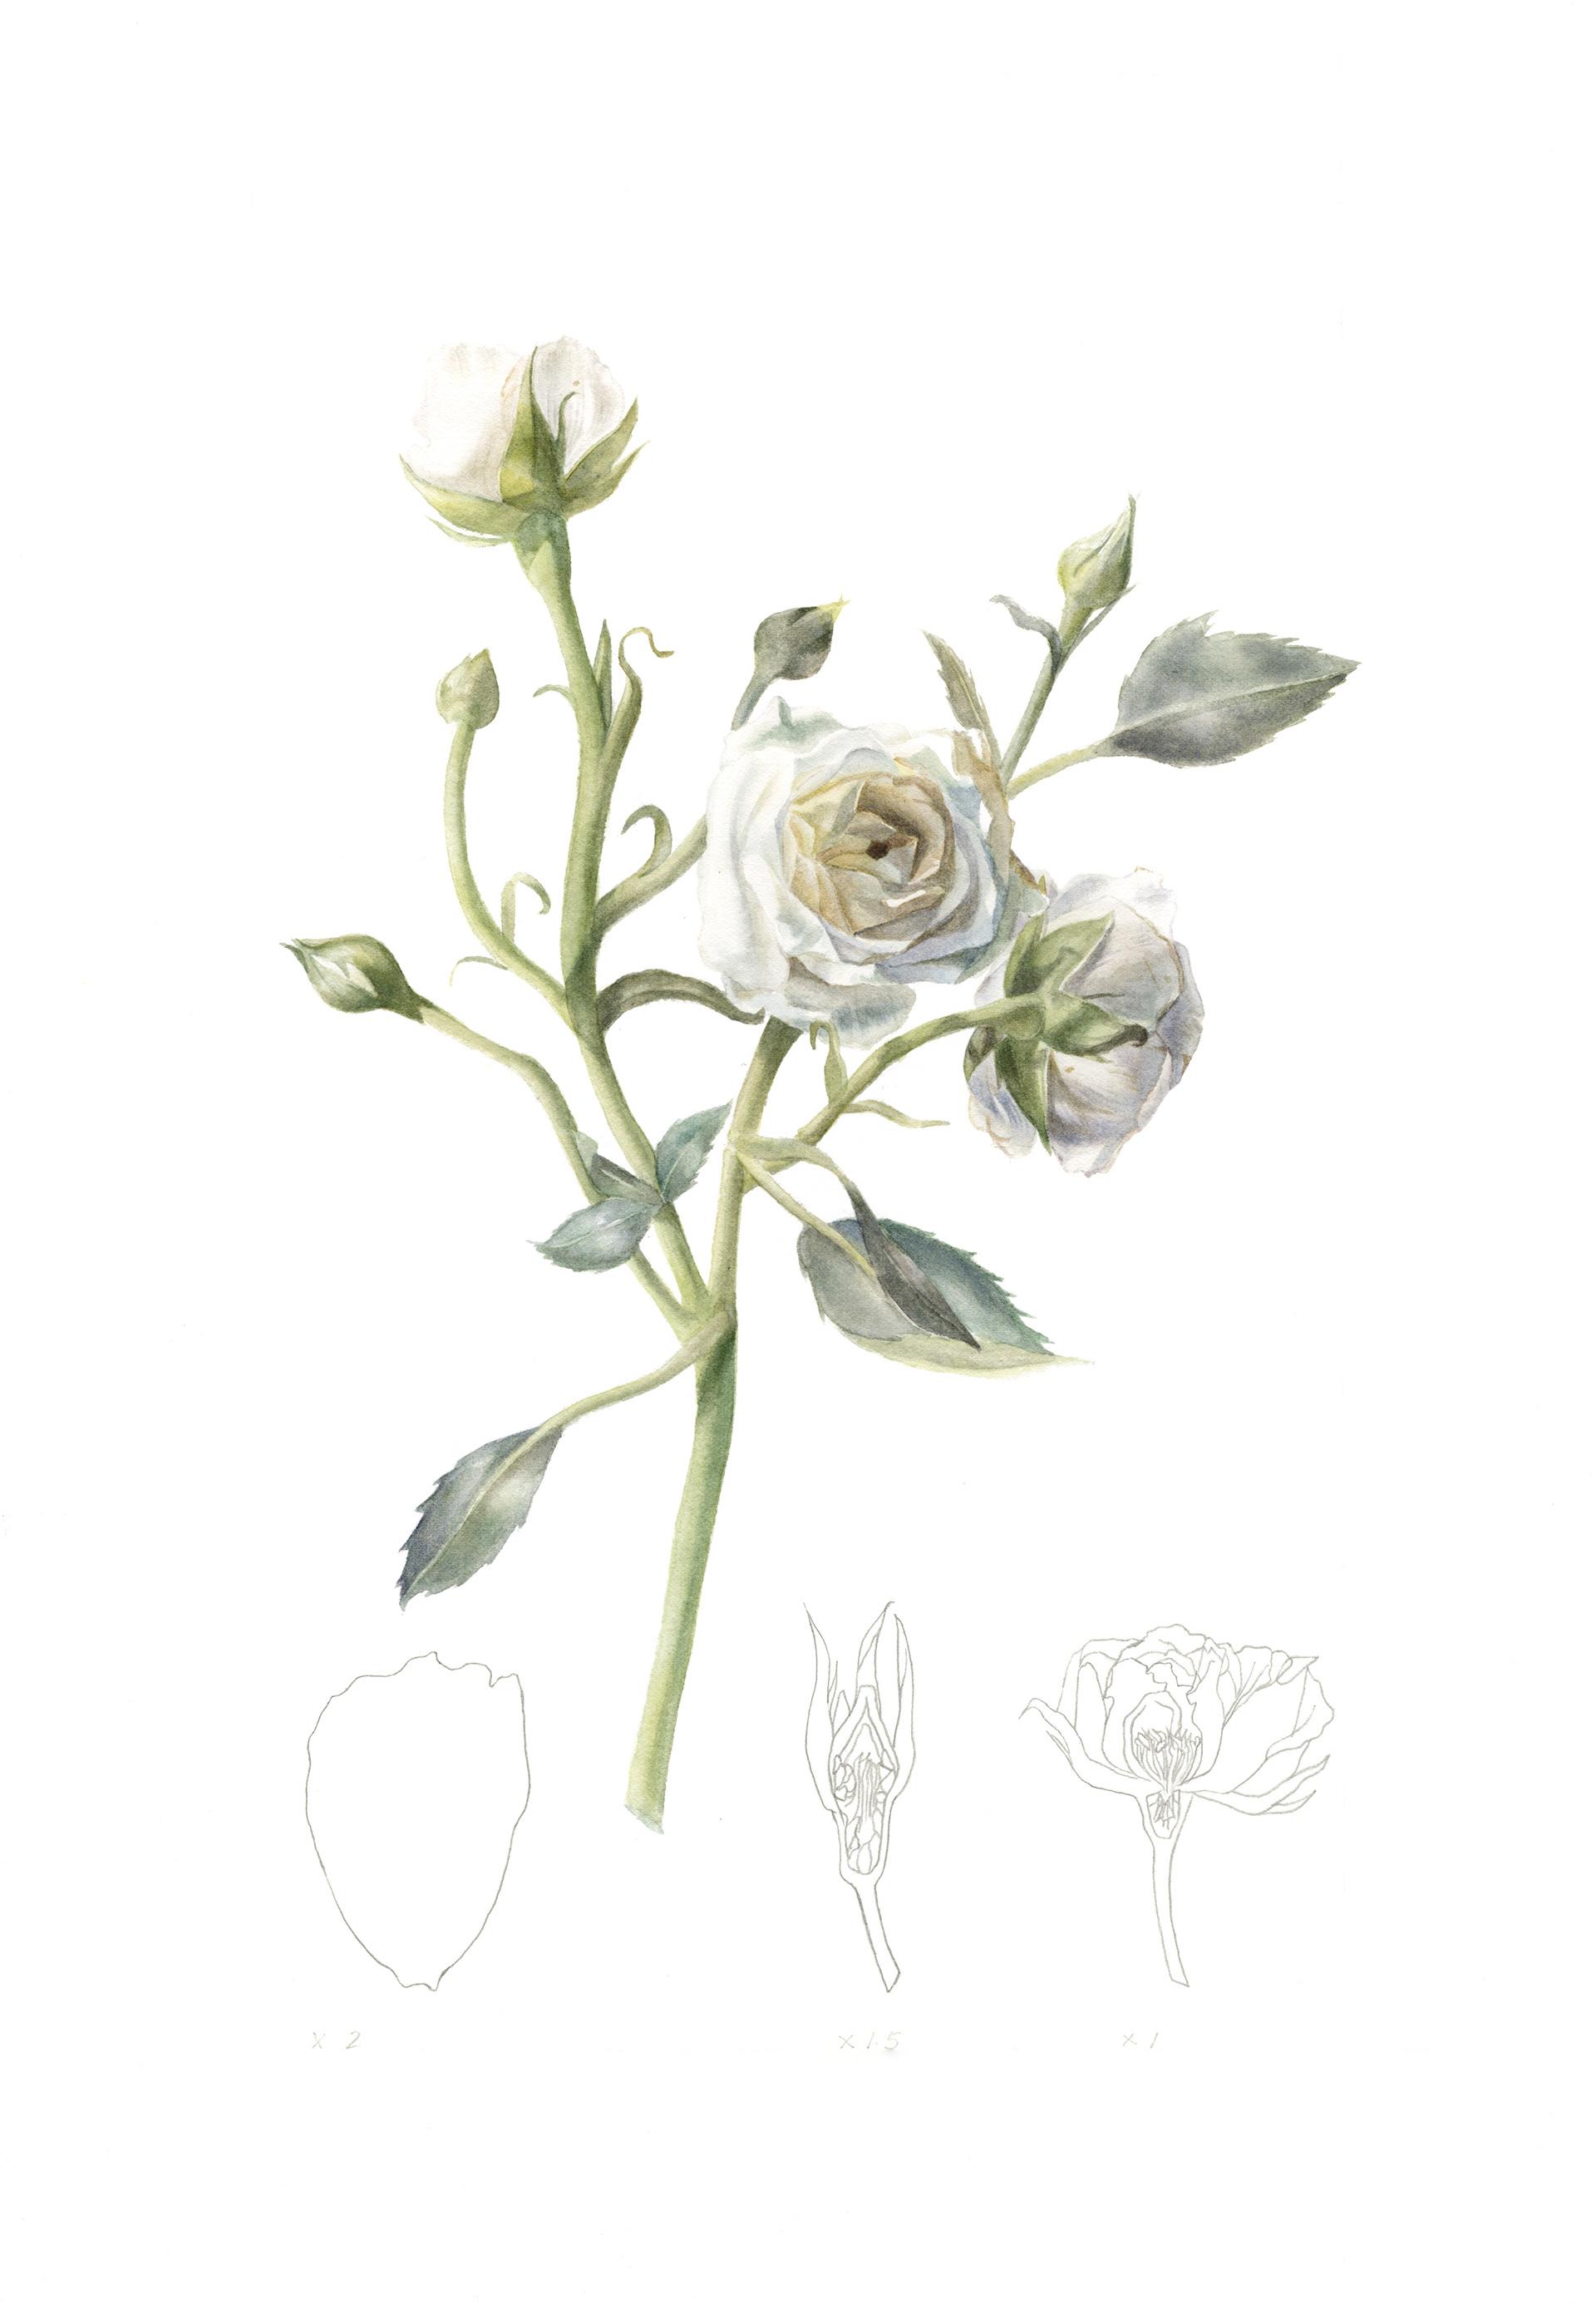 Kin lok ching white tea rose white tea rose mightylinksfo